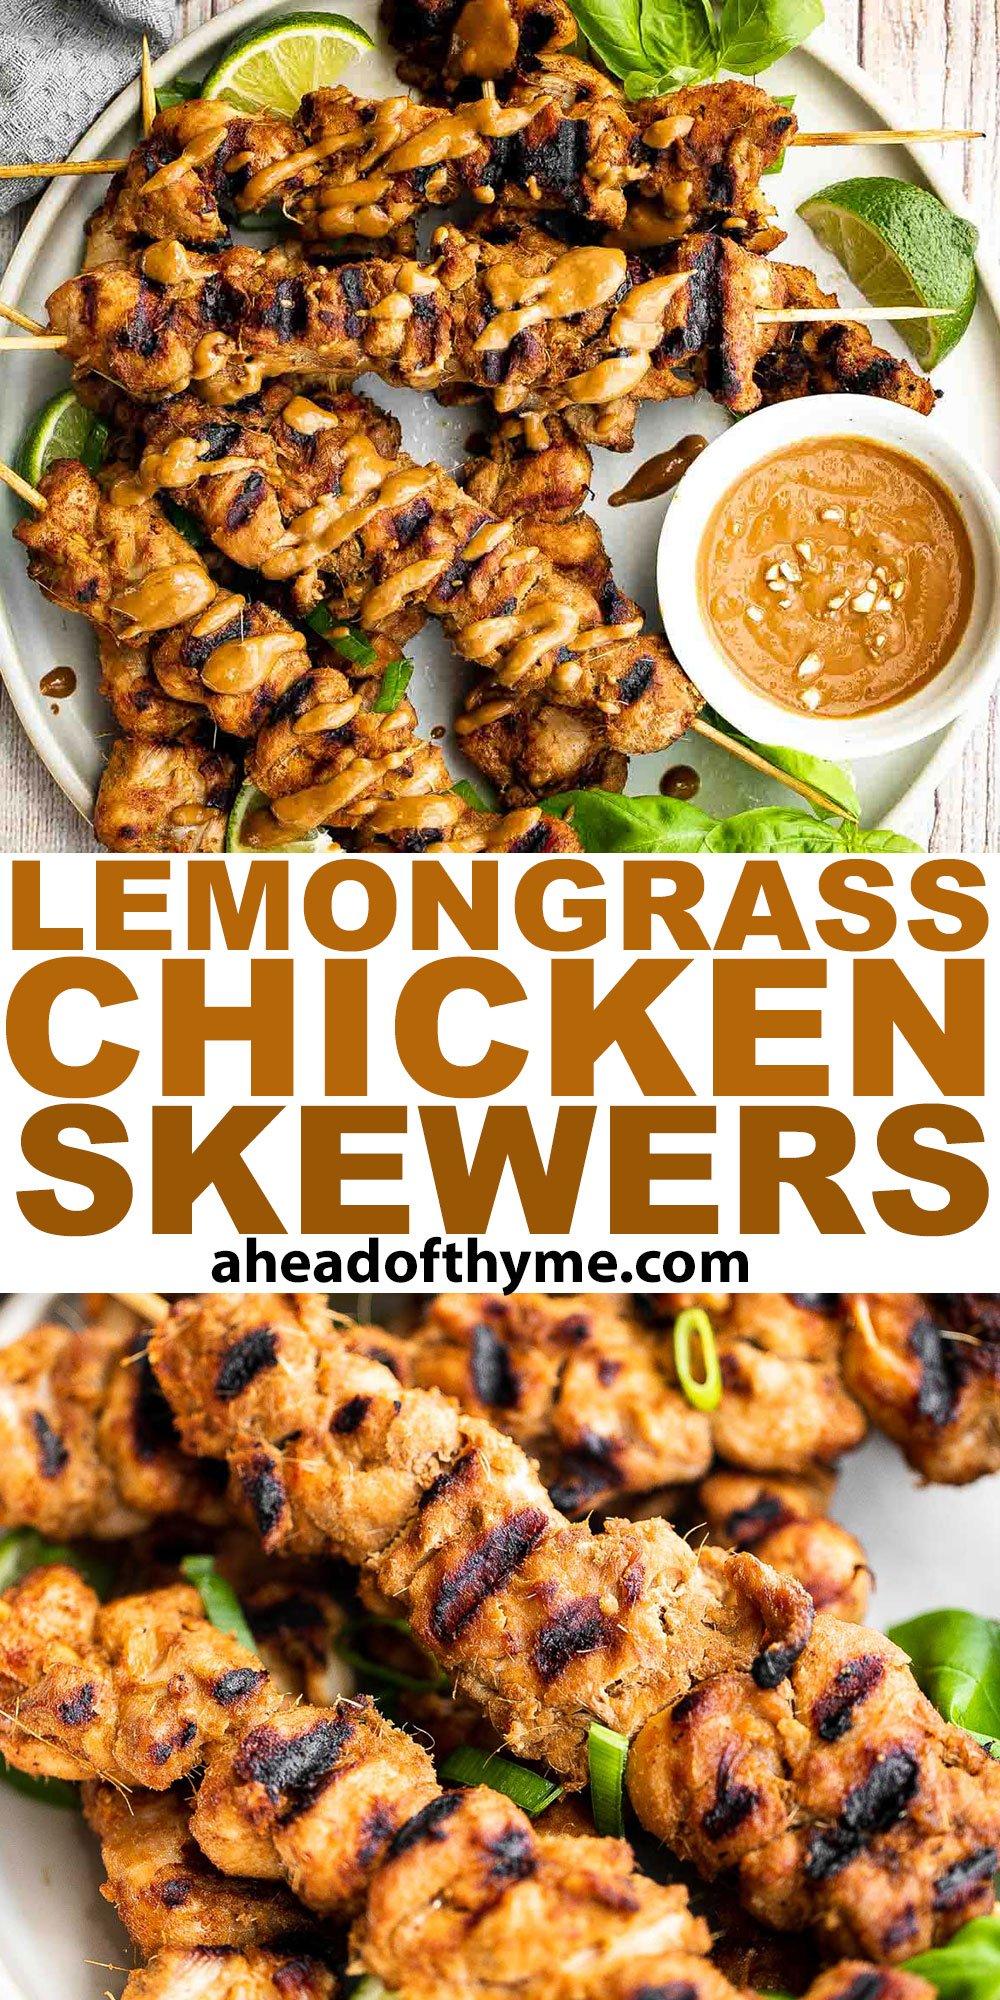 Lemongrass Chicken Skewers